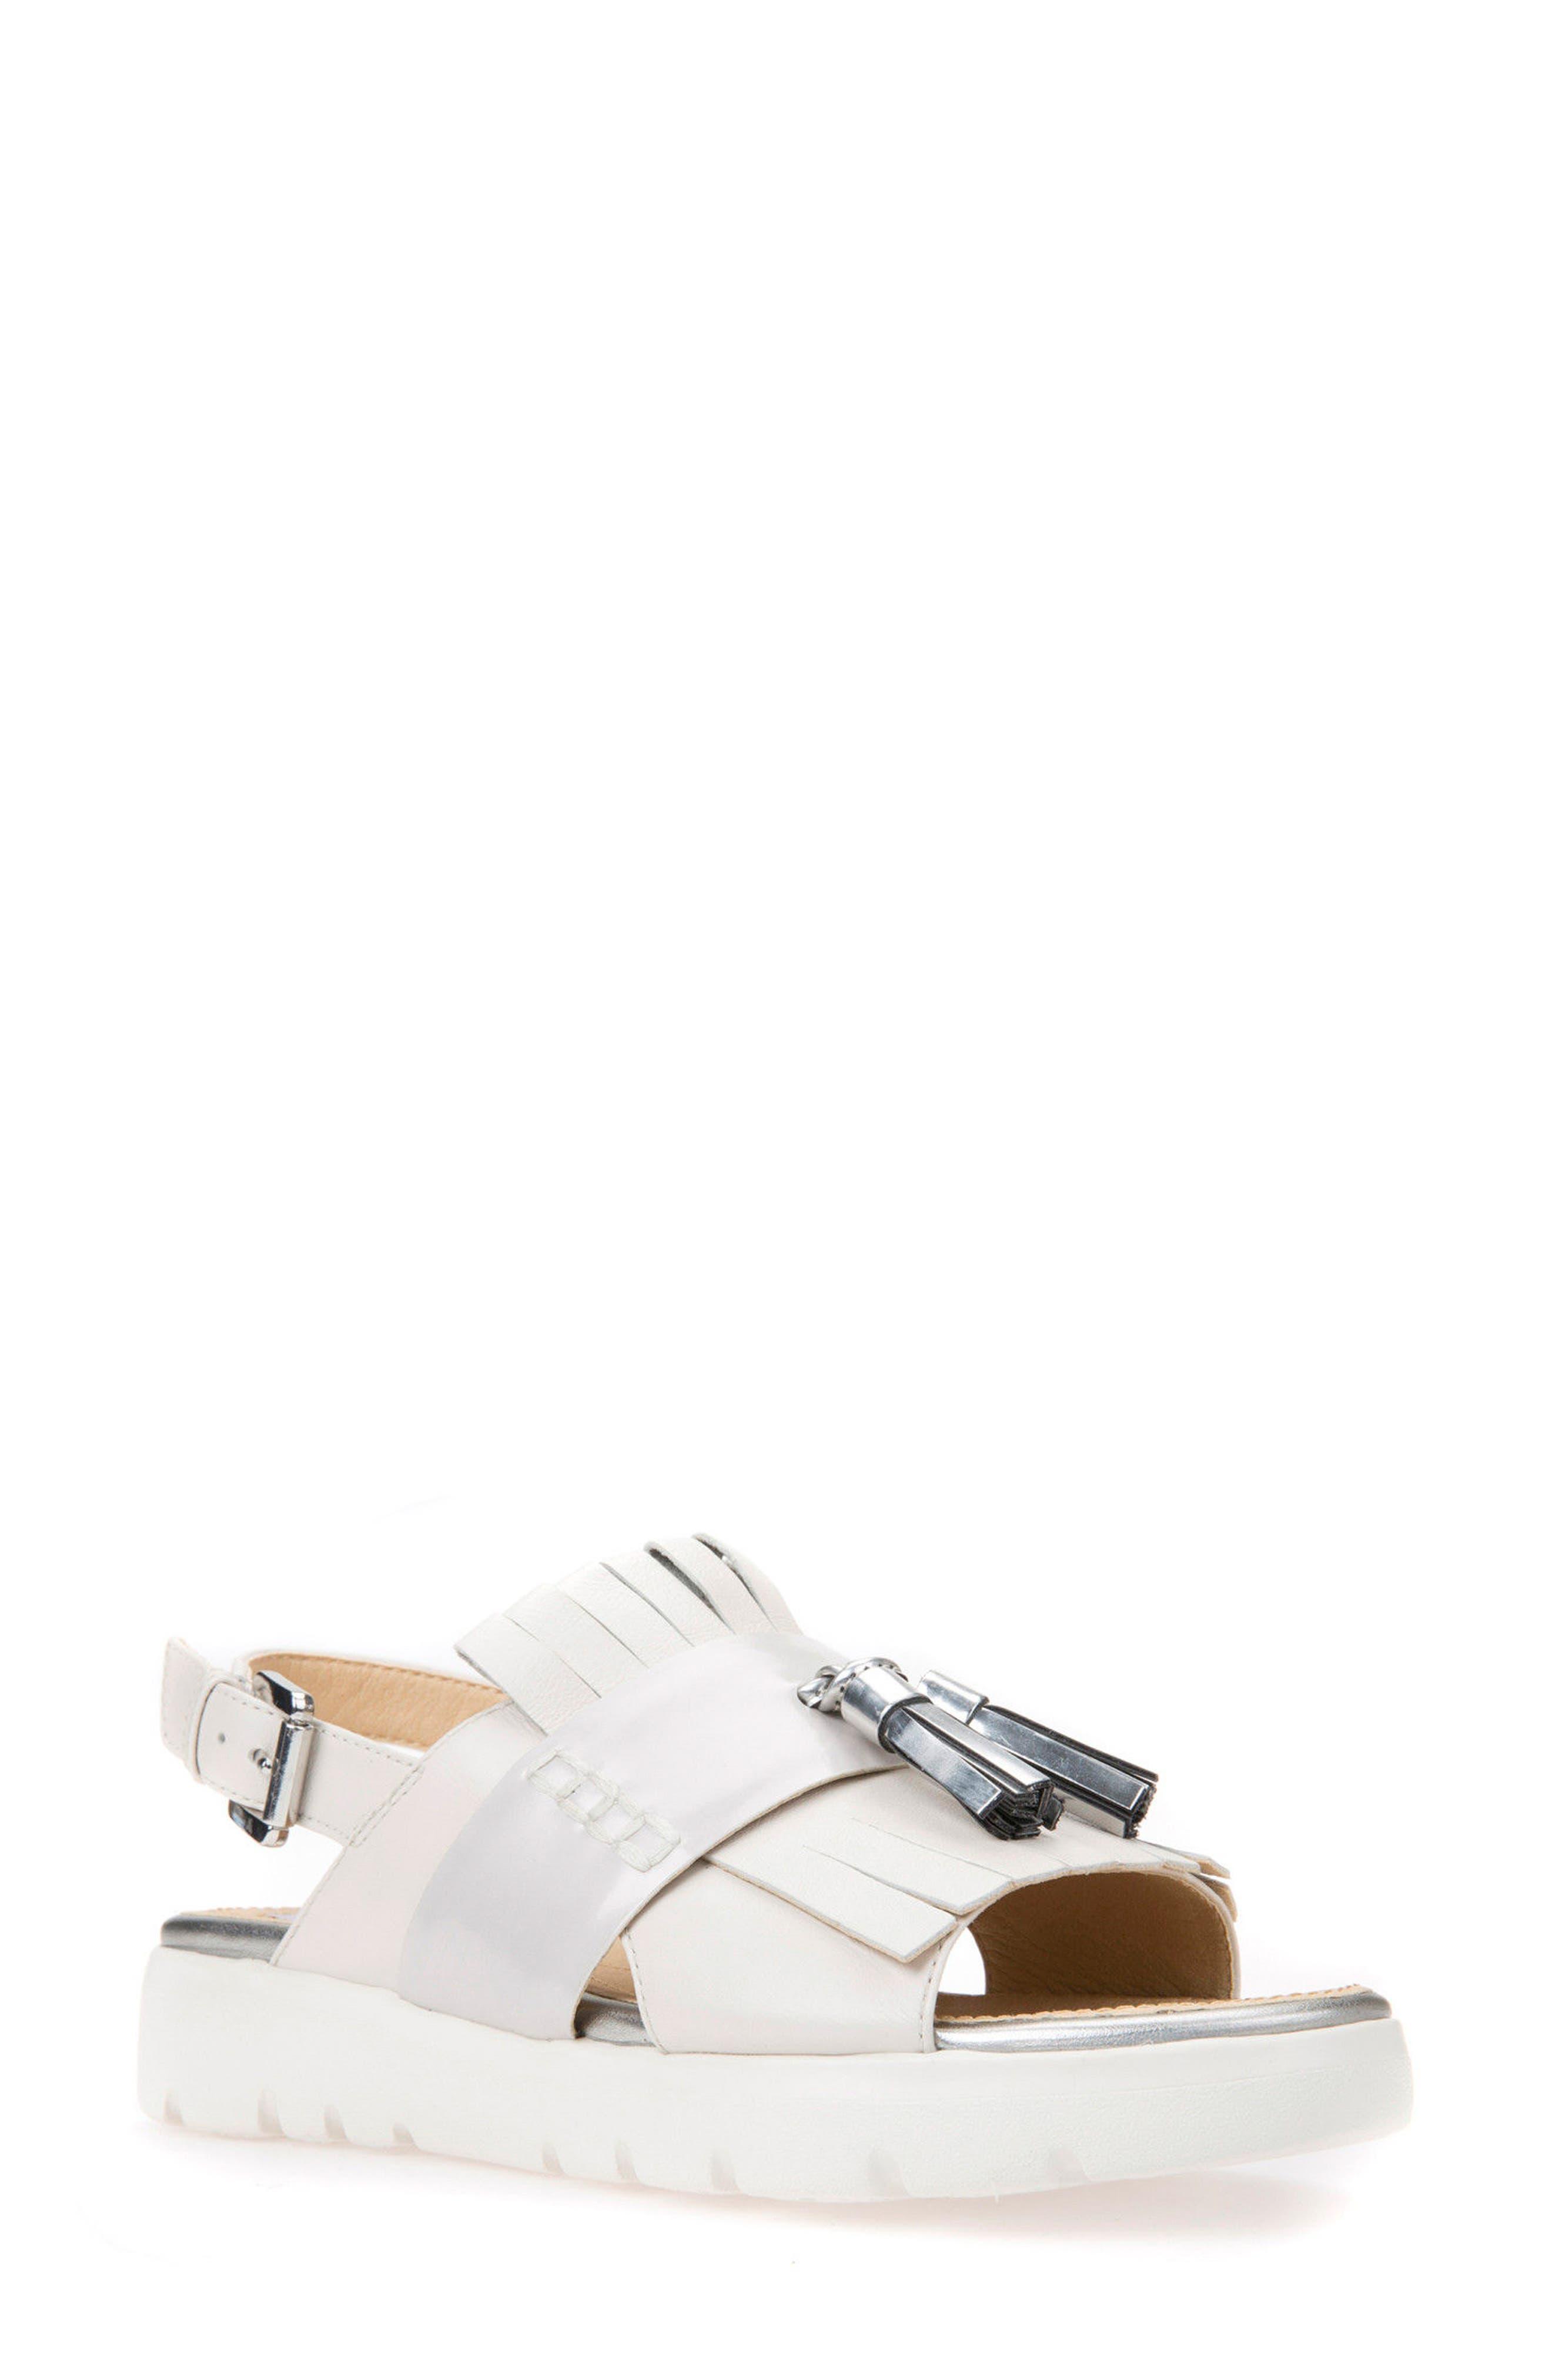 Amalitha Platform Sandal,                             Main thumbnail 1, color,                             OFF WHITE LEATHER